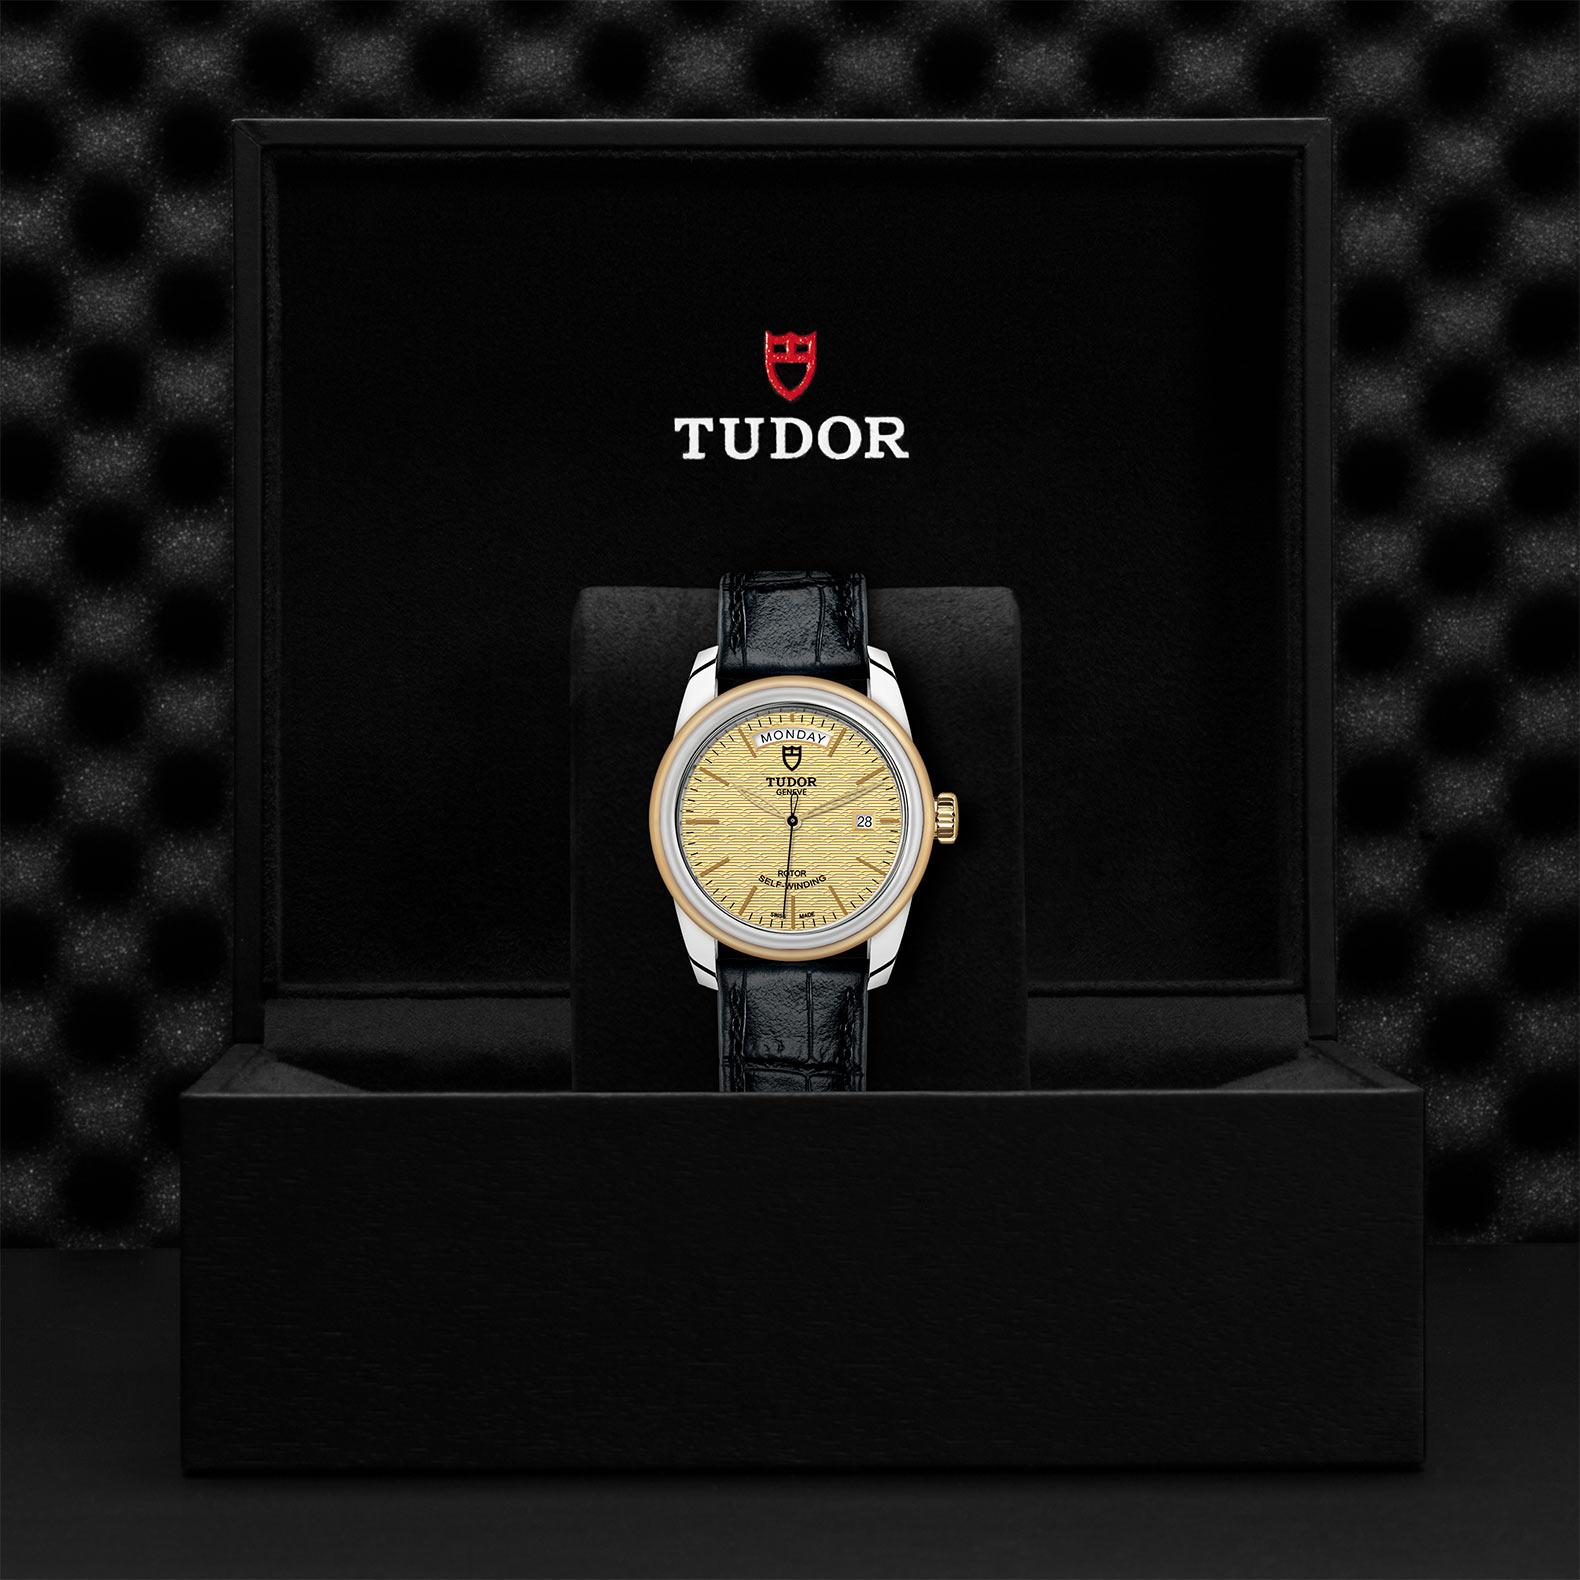 TUDOR Glamour Date Day M56003 0010 Presentationbox